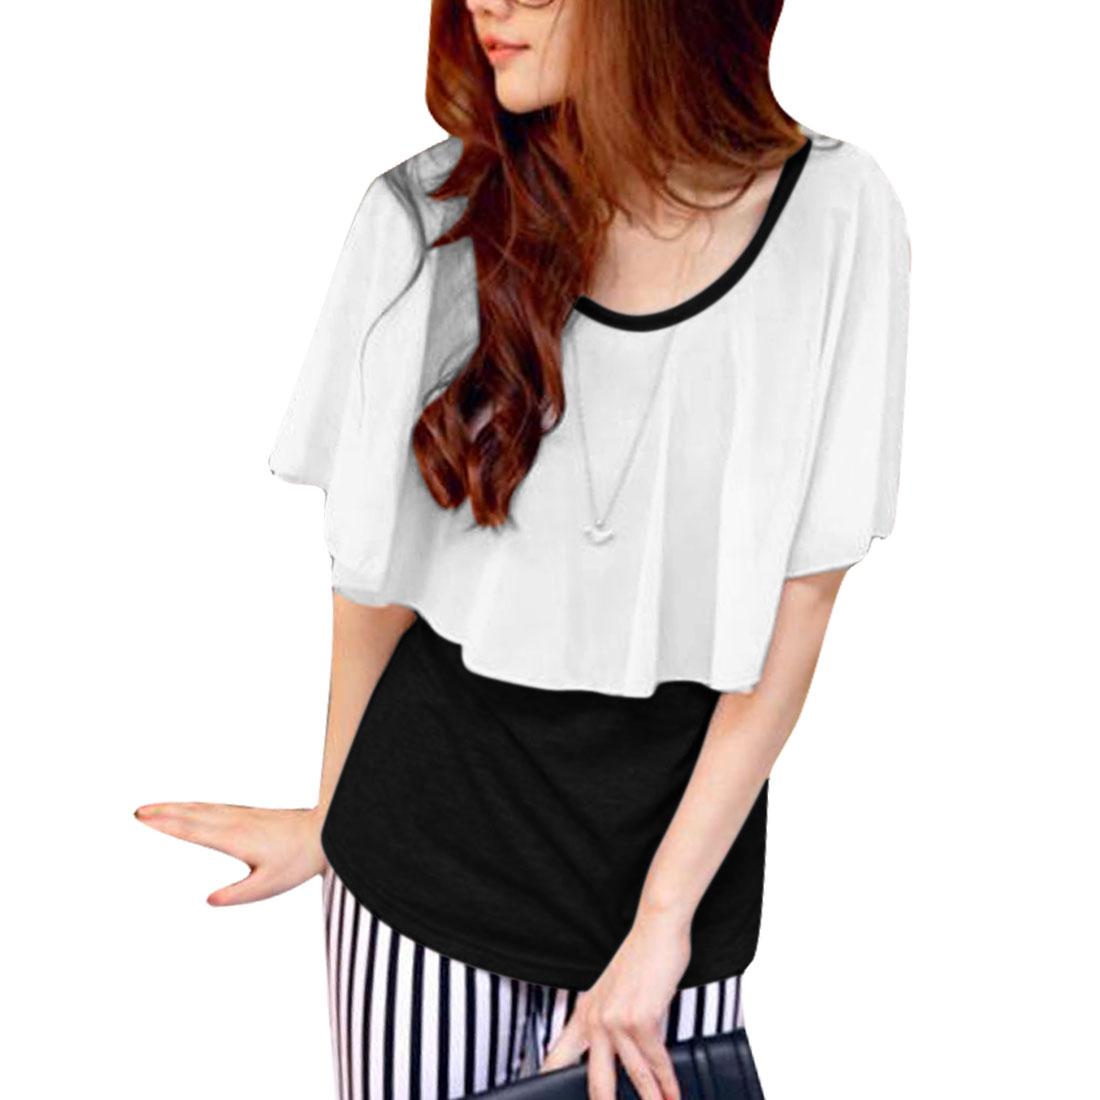 Ladies Round Neck Cape Design Blouse Black White XS